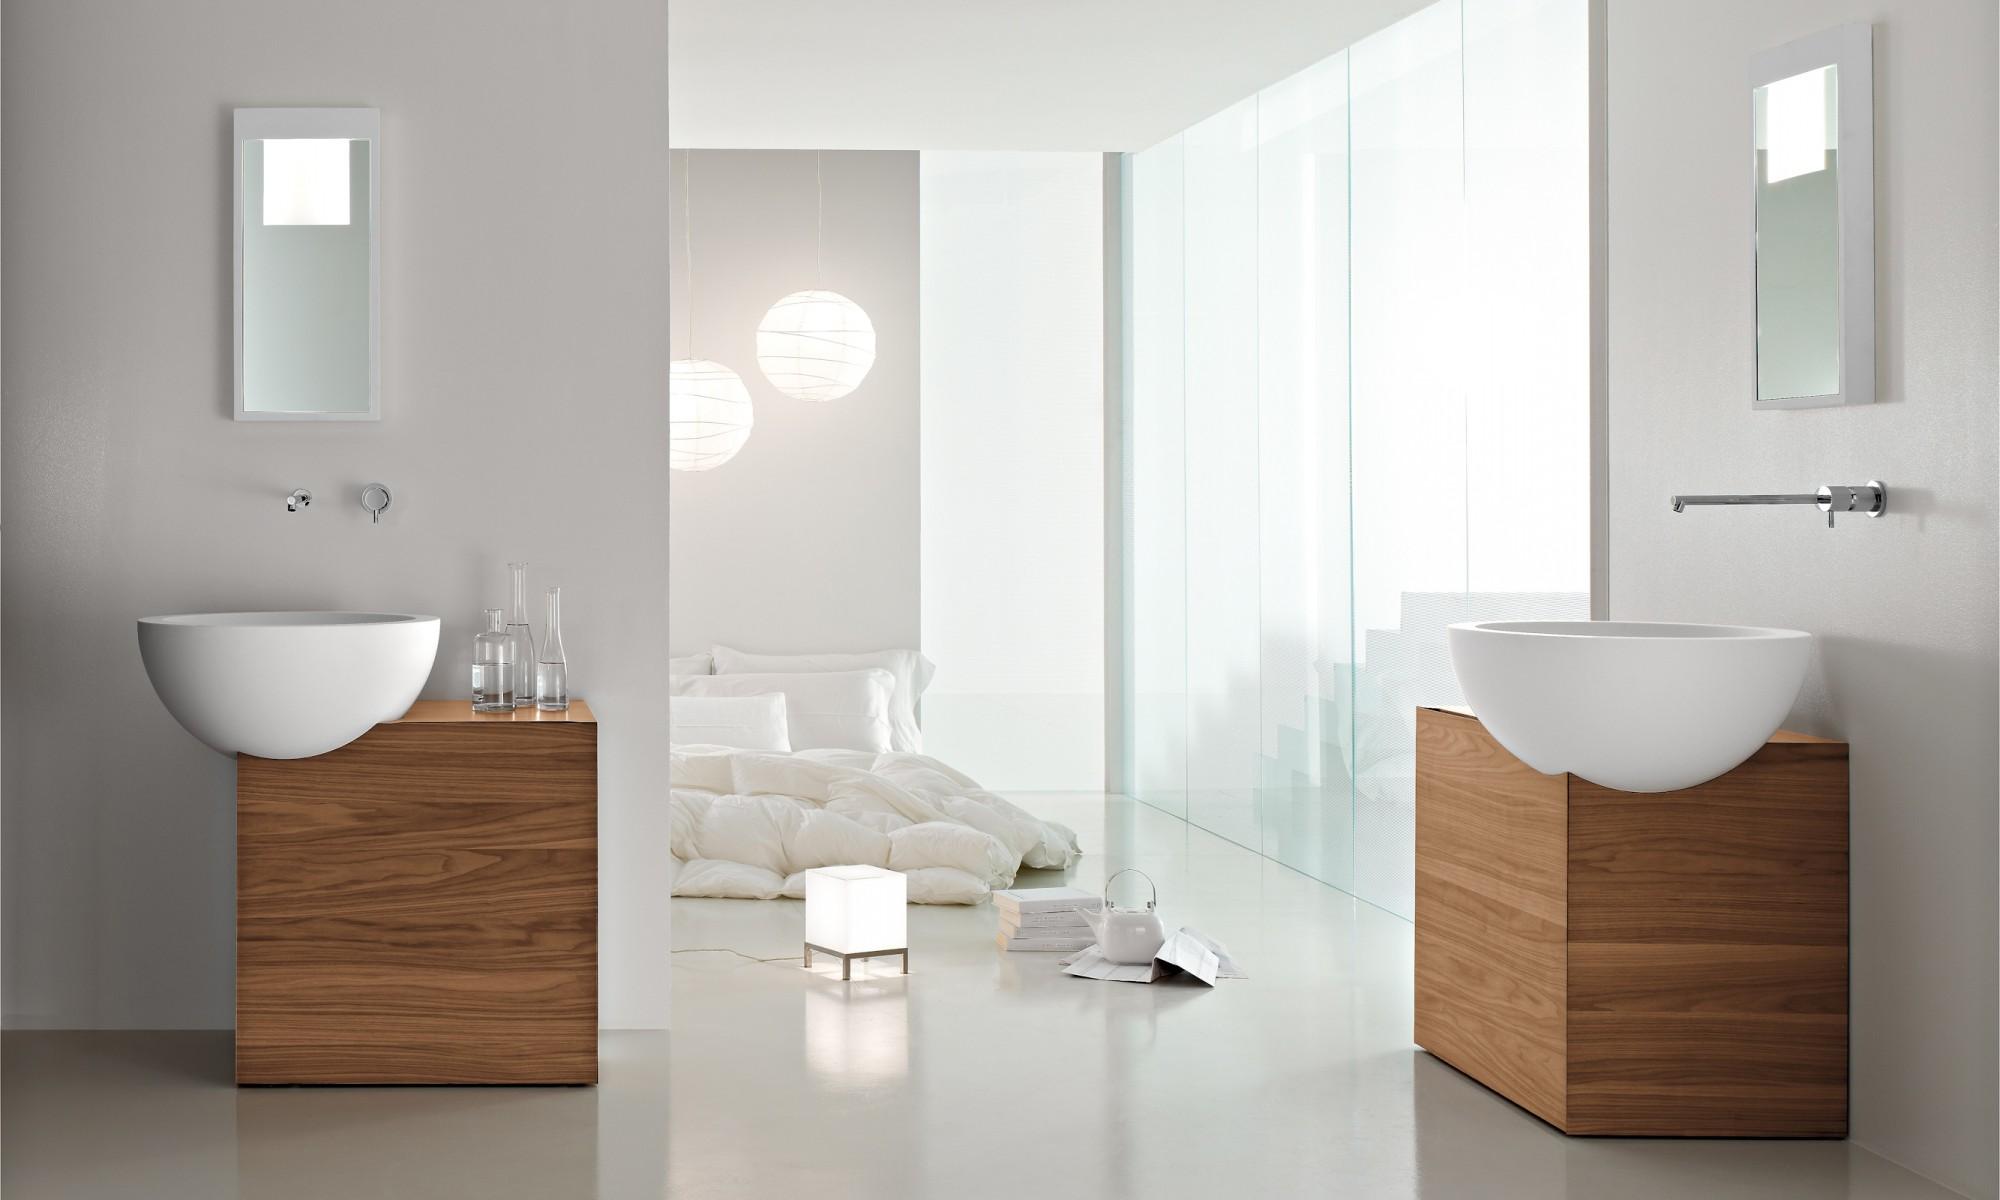 صور ديكورات حمامات جديدة مودرن فخمة 2016 (33)